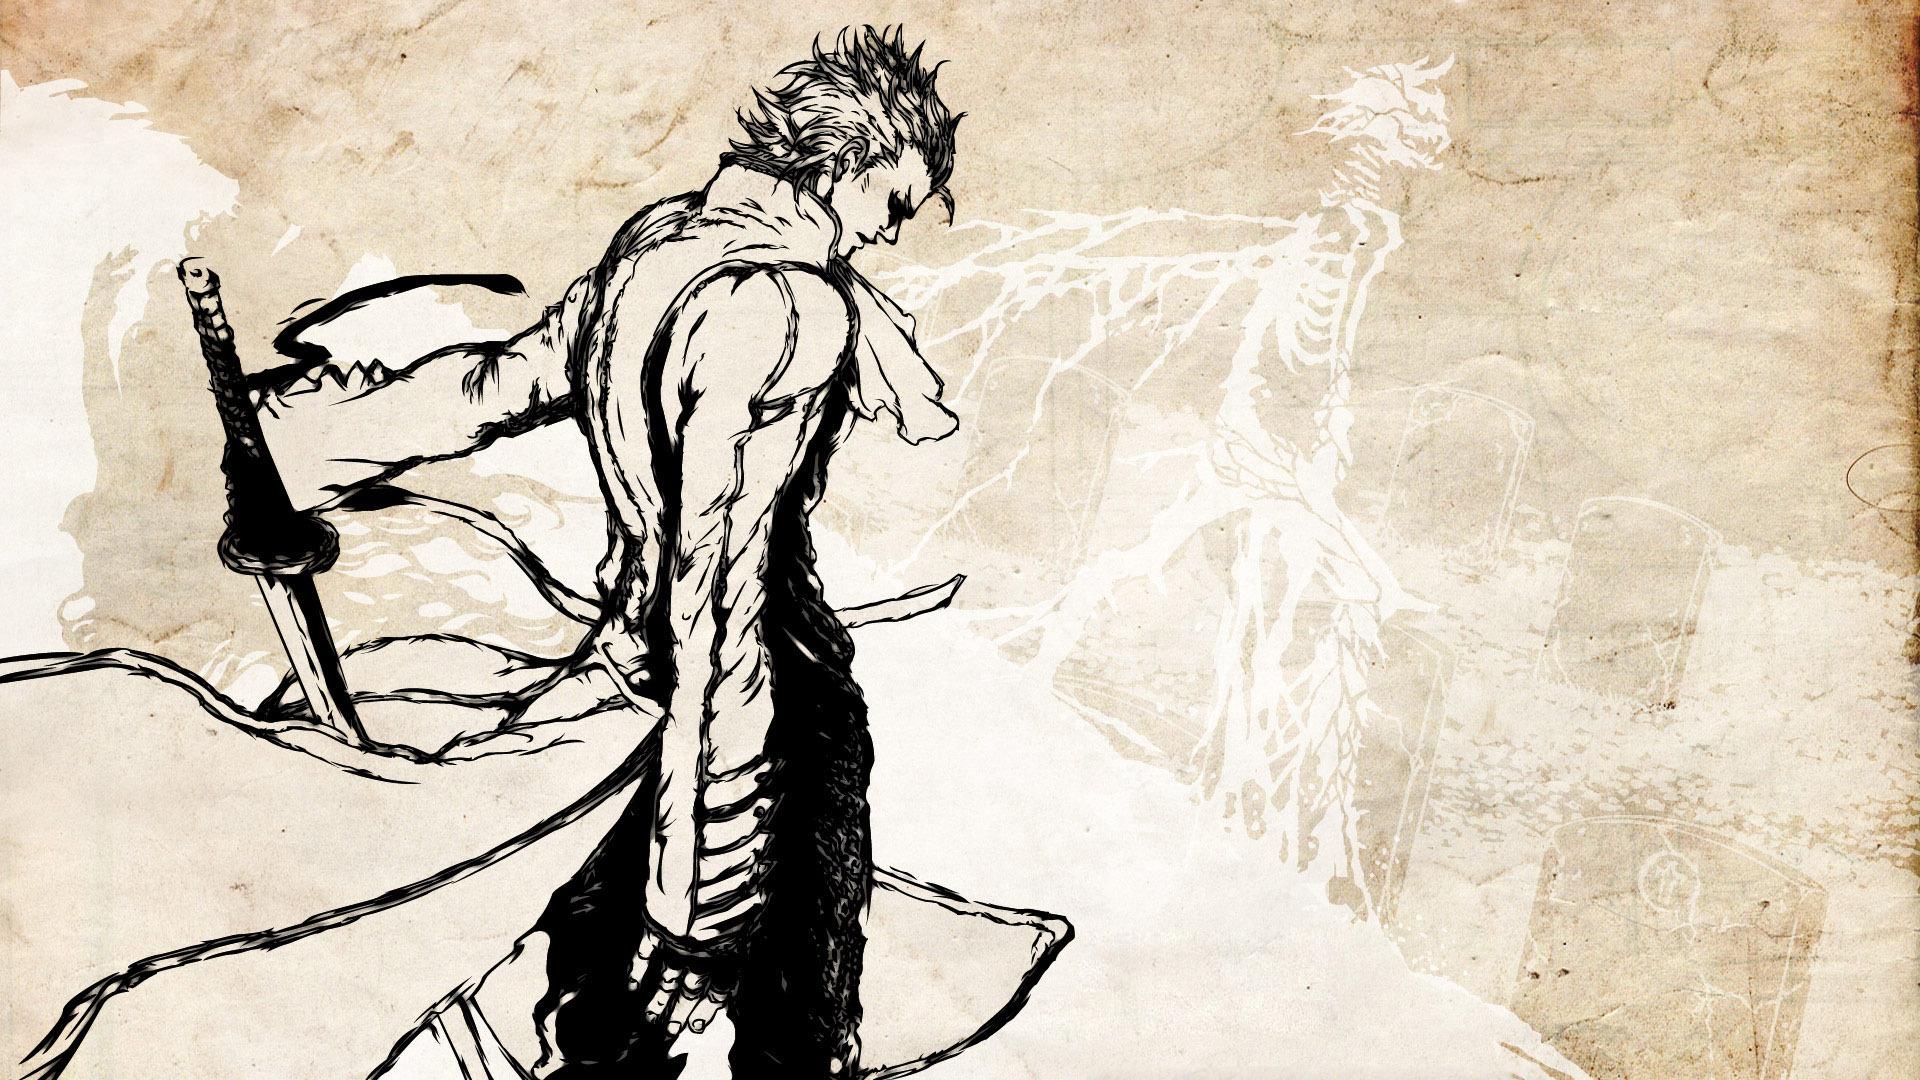 Vergil   Devil May Cry wallpaper 4646 1920x1080